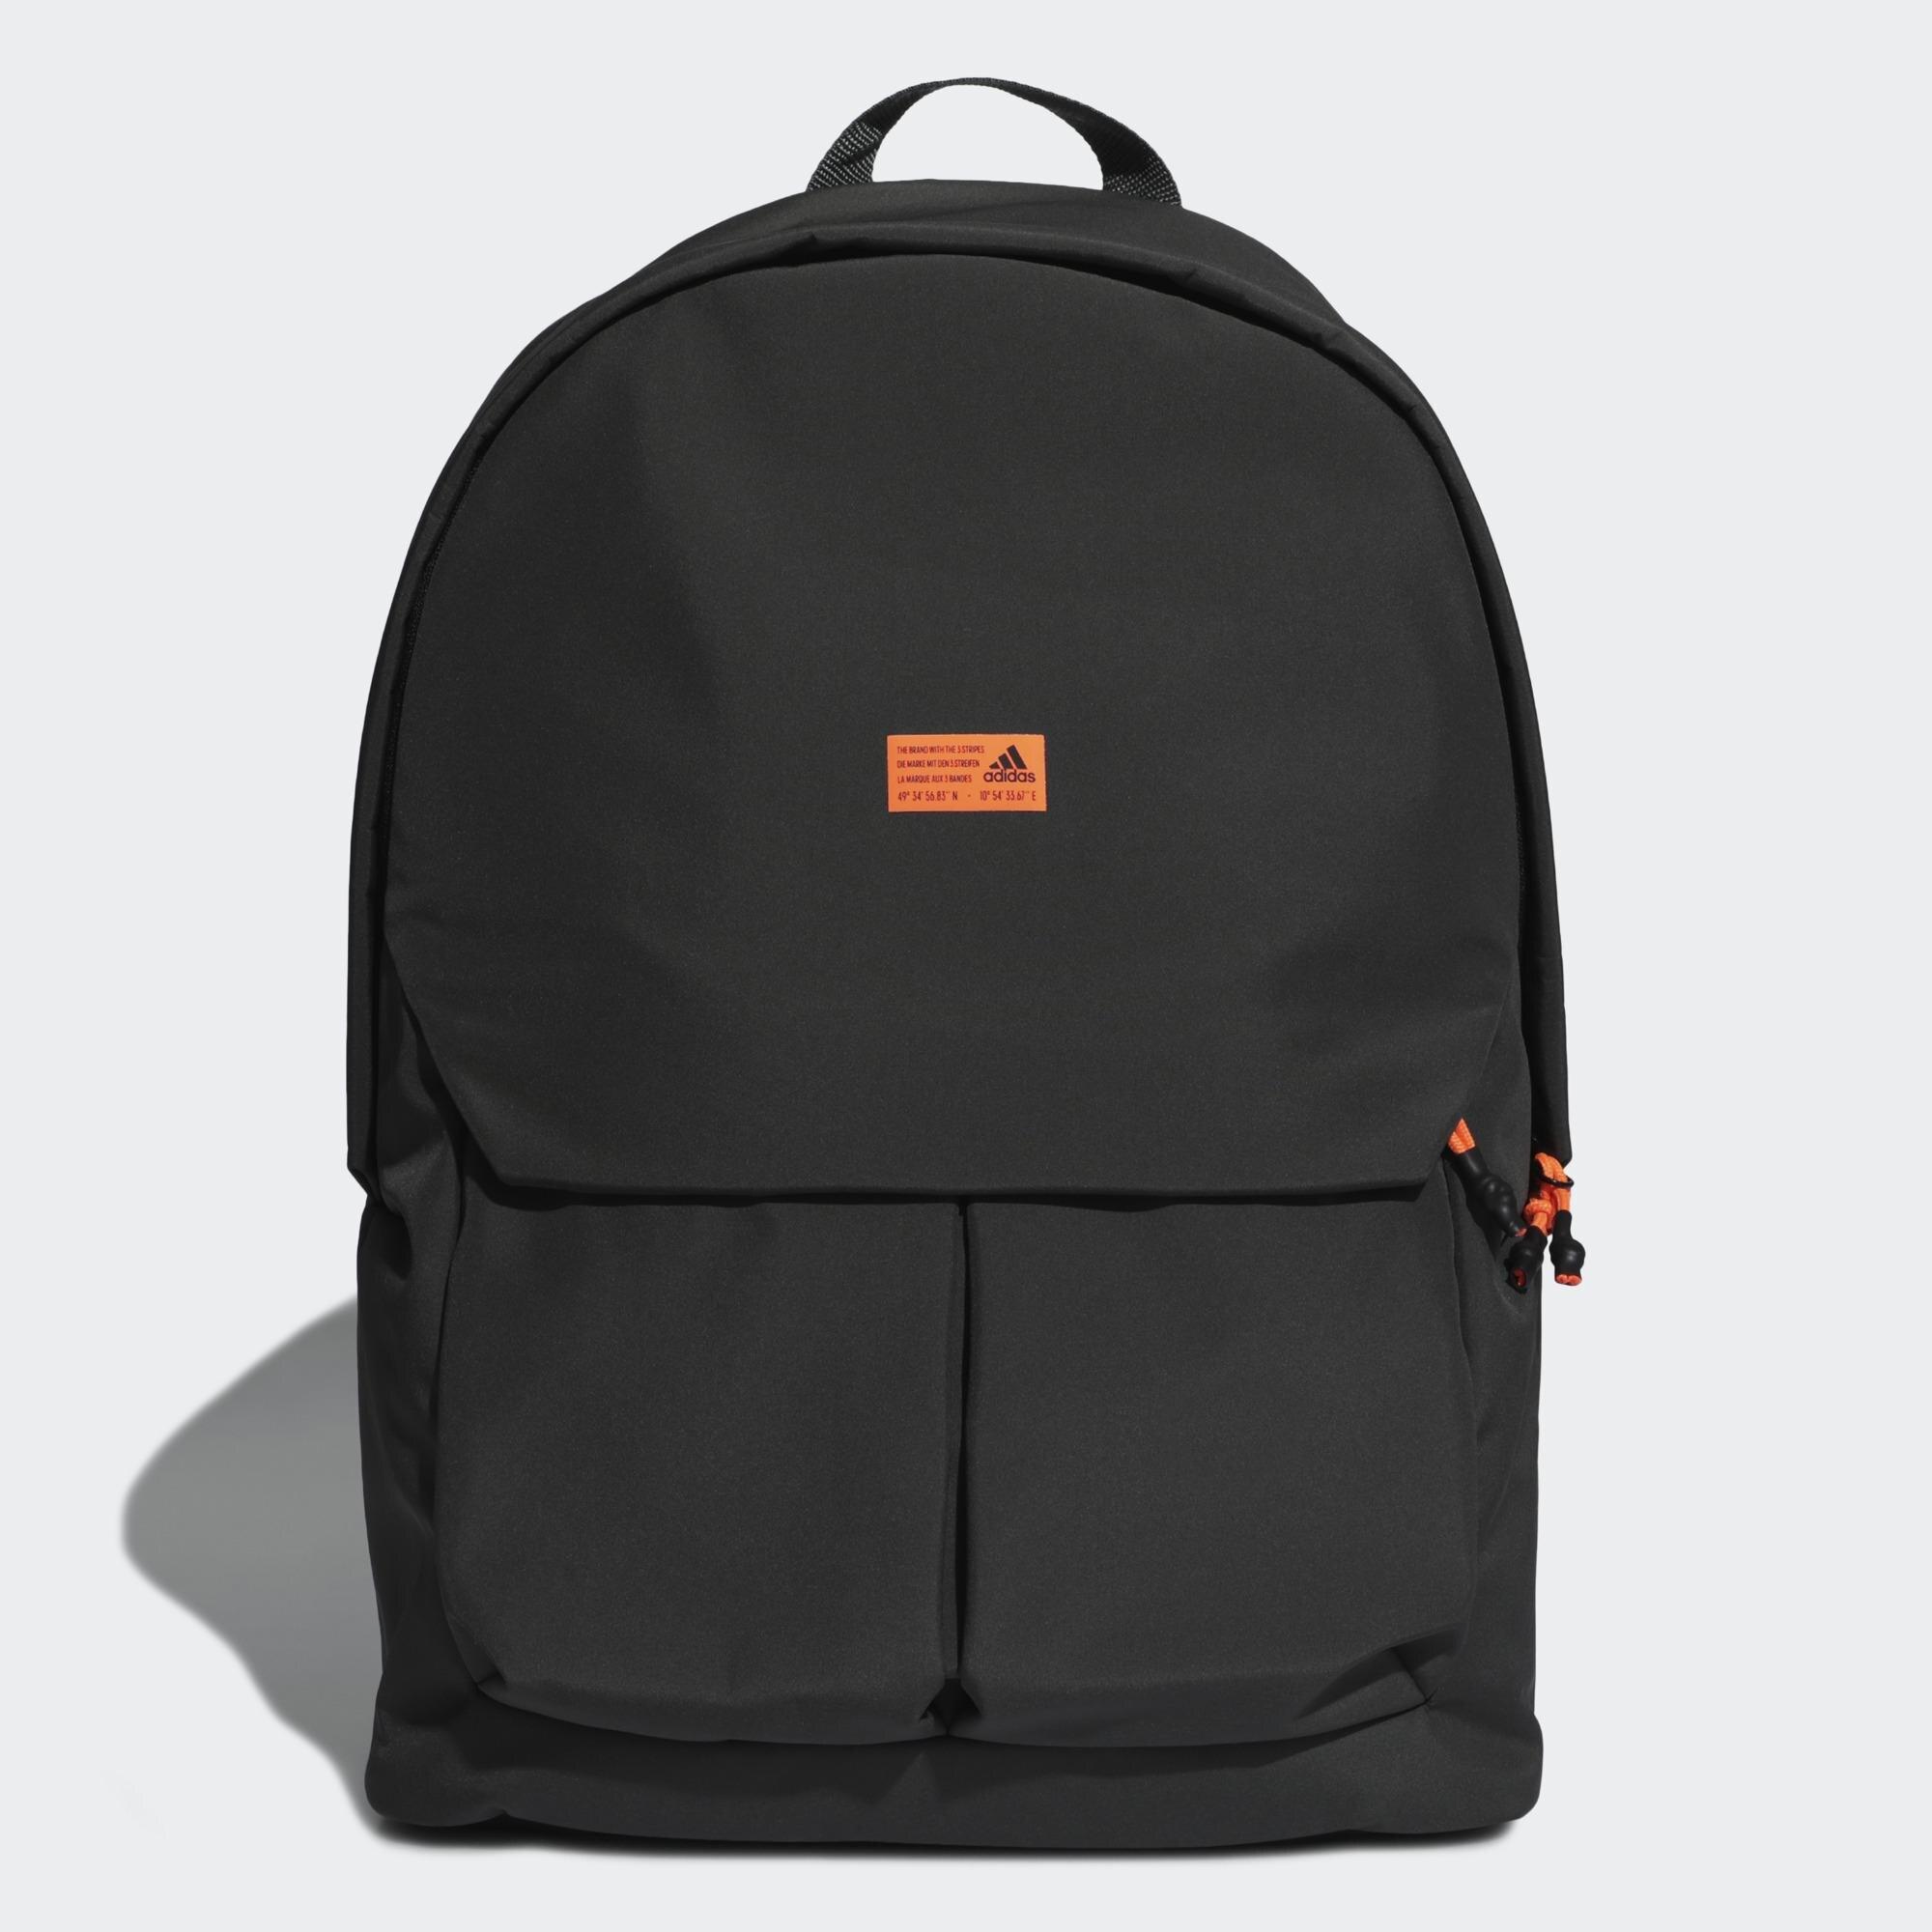 ADIDAS CLAS BP WINTER 後背包 休閒 拉鍊前袋 筆電隔層 小橘標 墨綠色【運動世界】FT9963